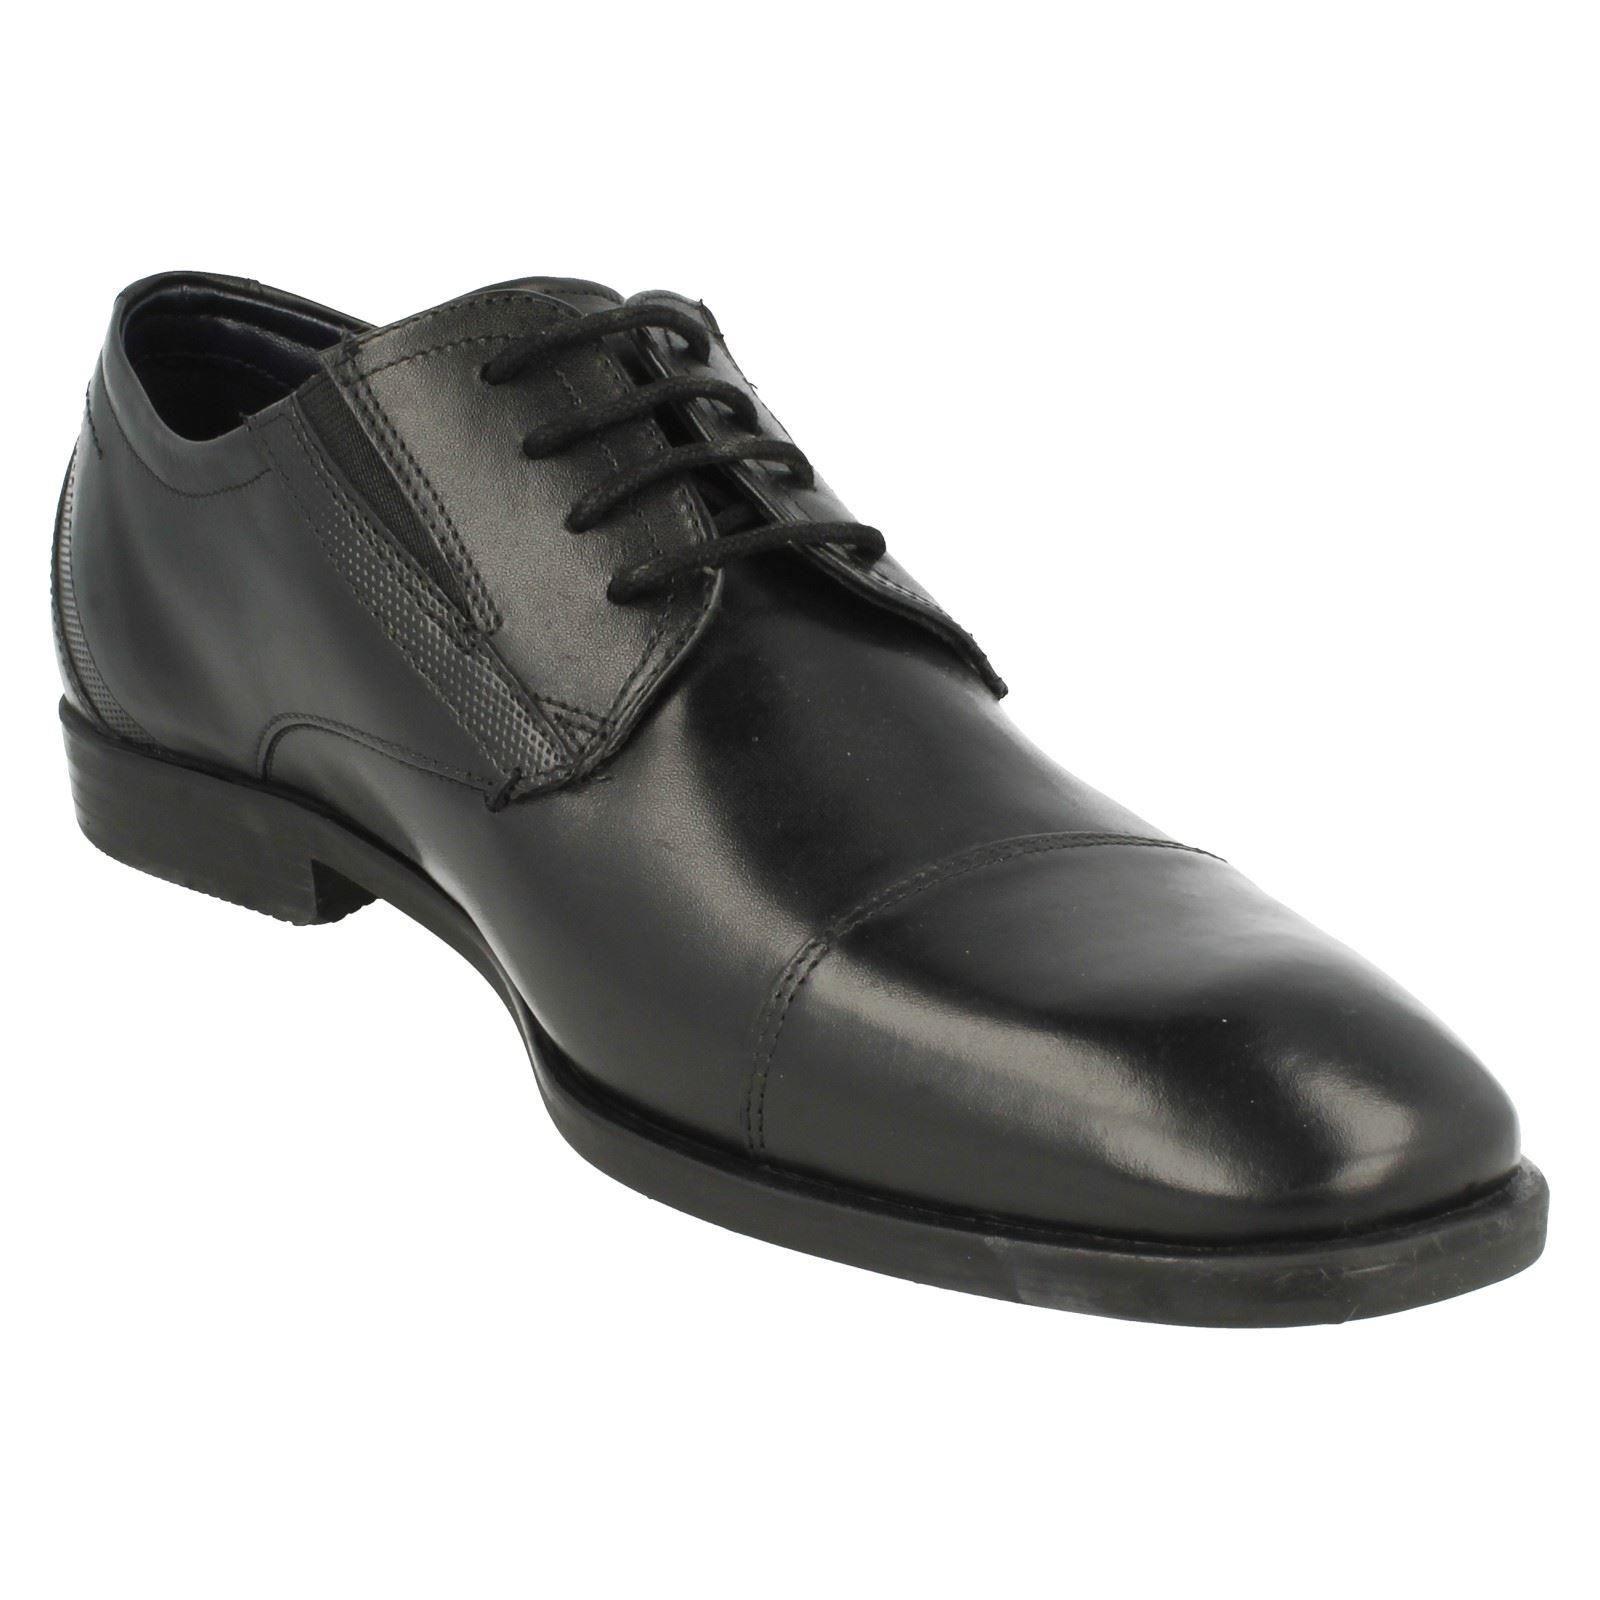 Herren Evo Bugatti Smart Schuhes Savio Evo Herren R3504-1 32a87b